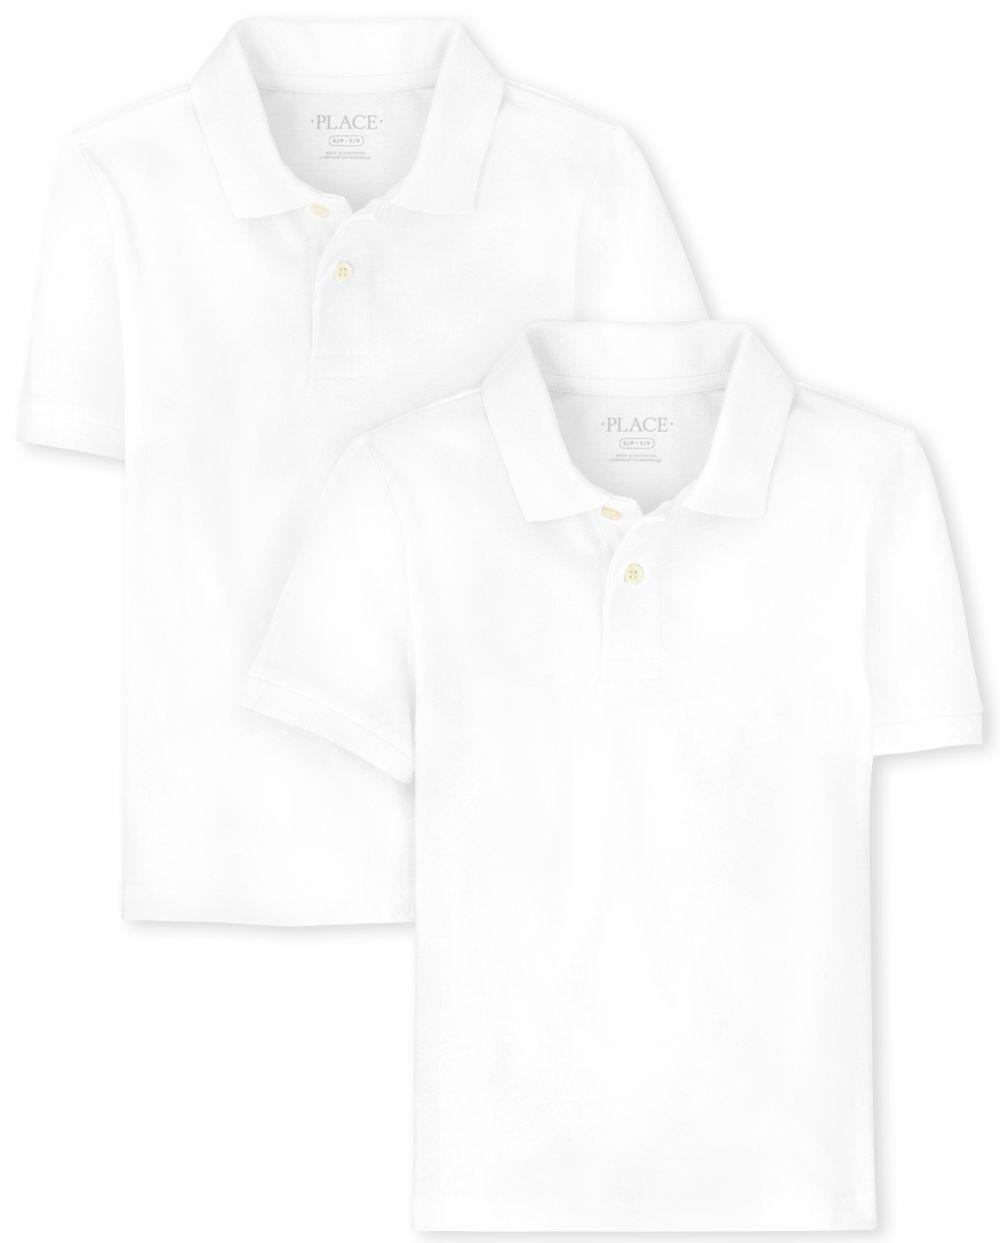 Boys Uniform Jersey Polo 2-Pack